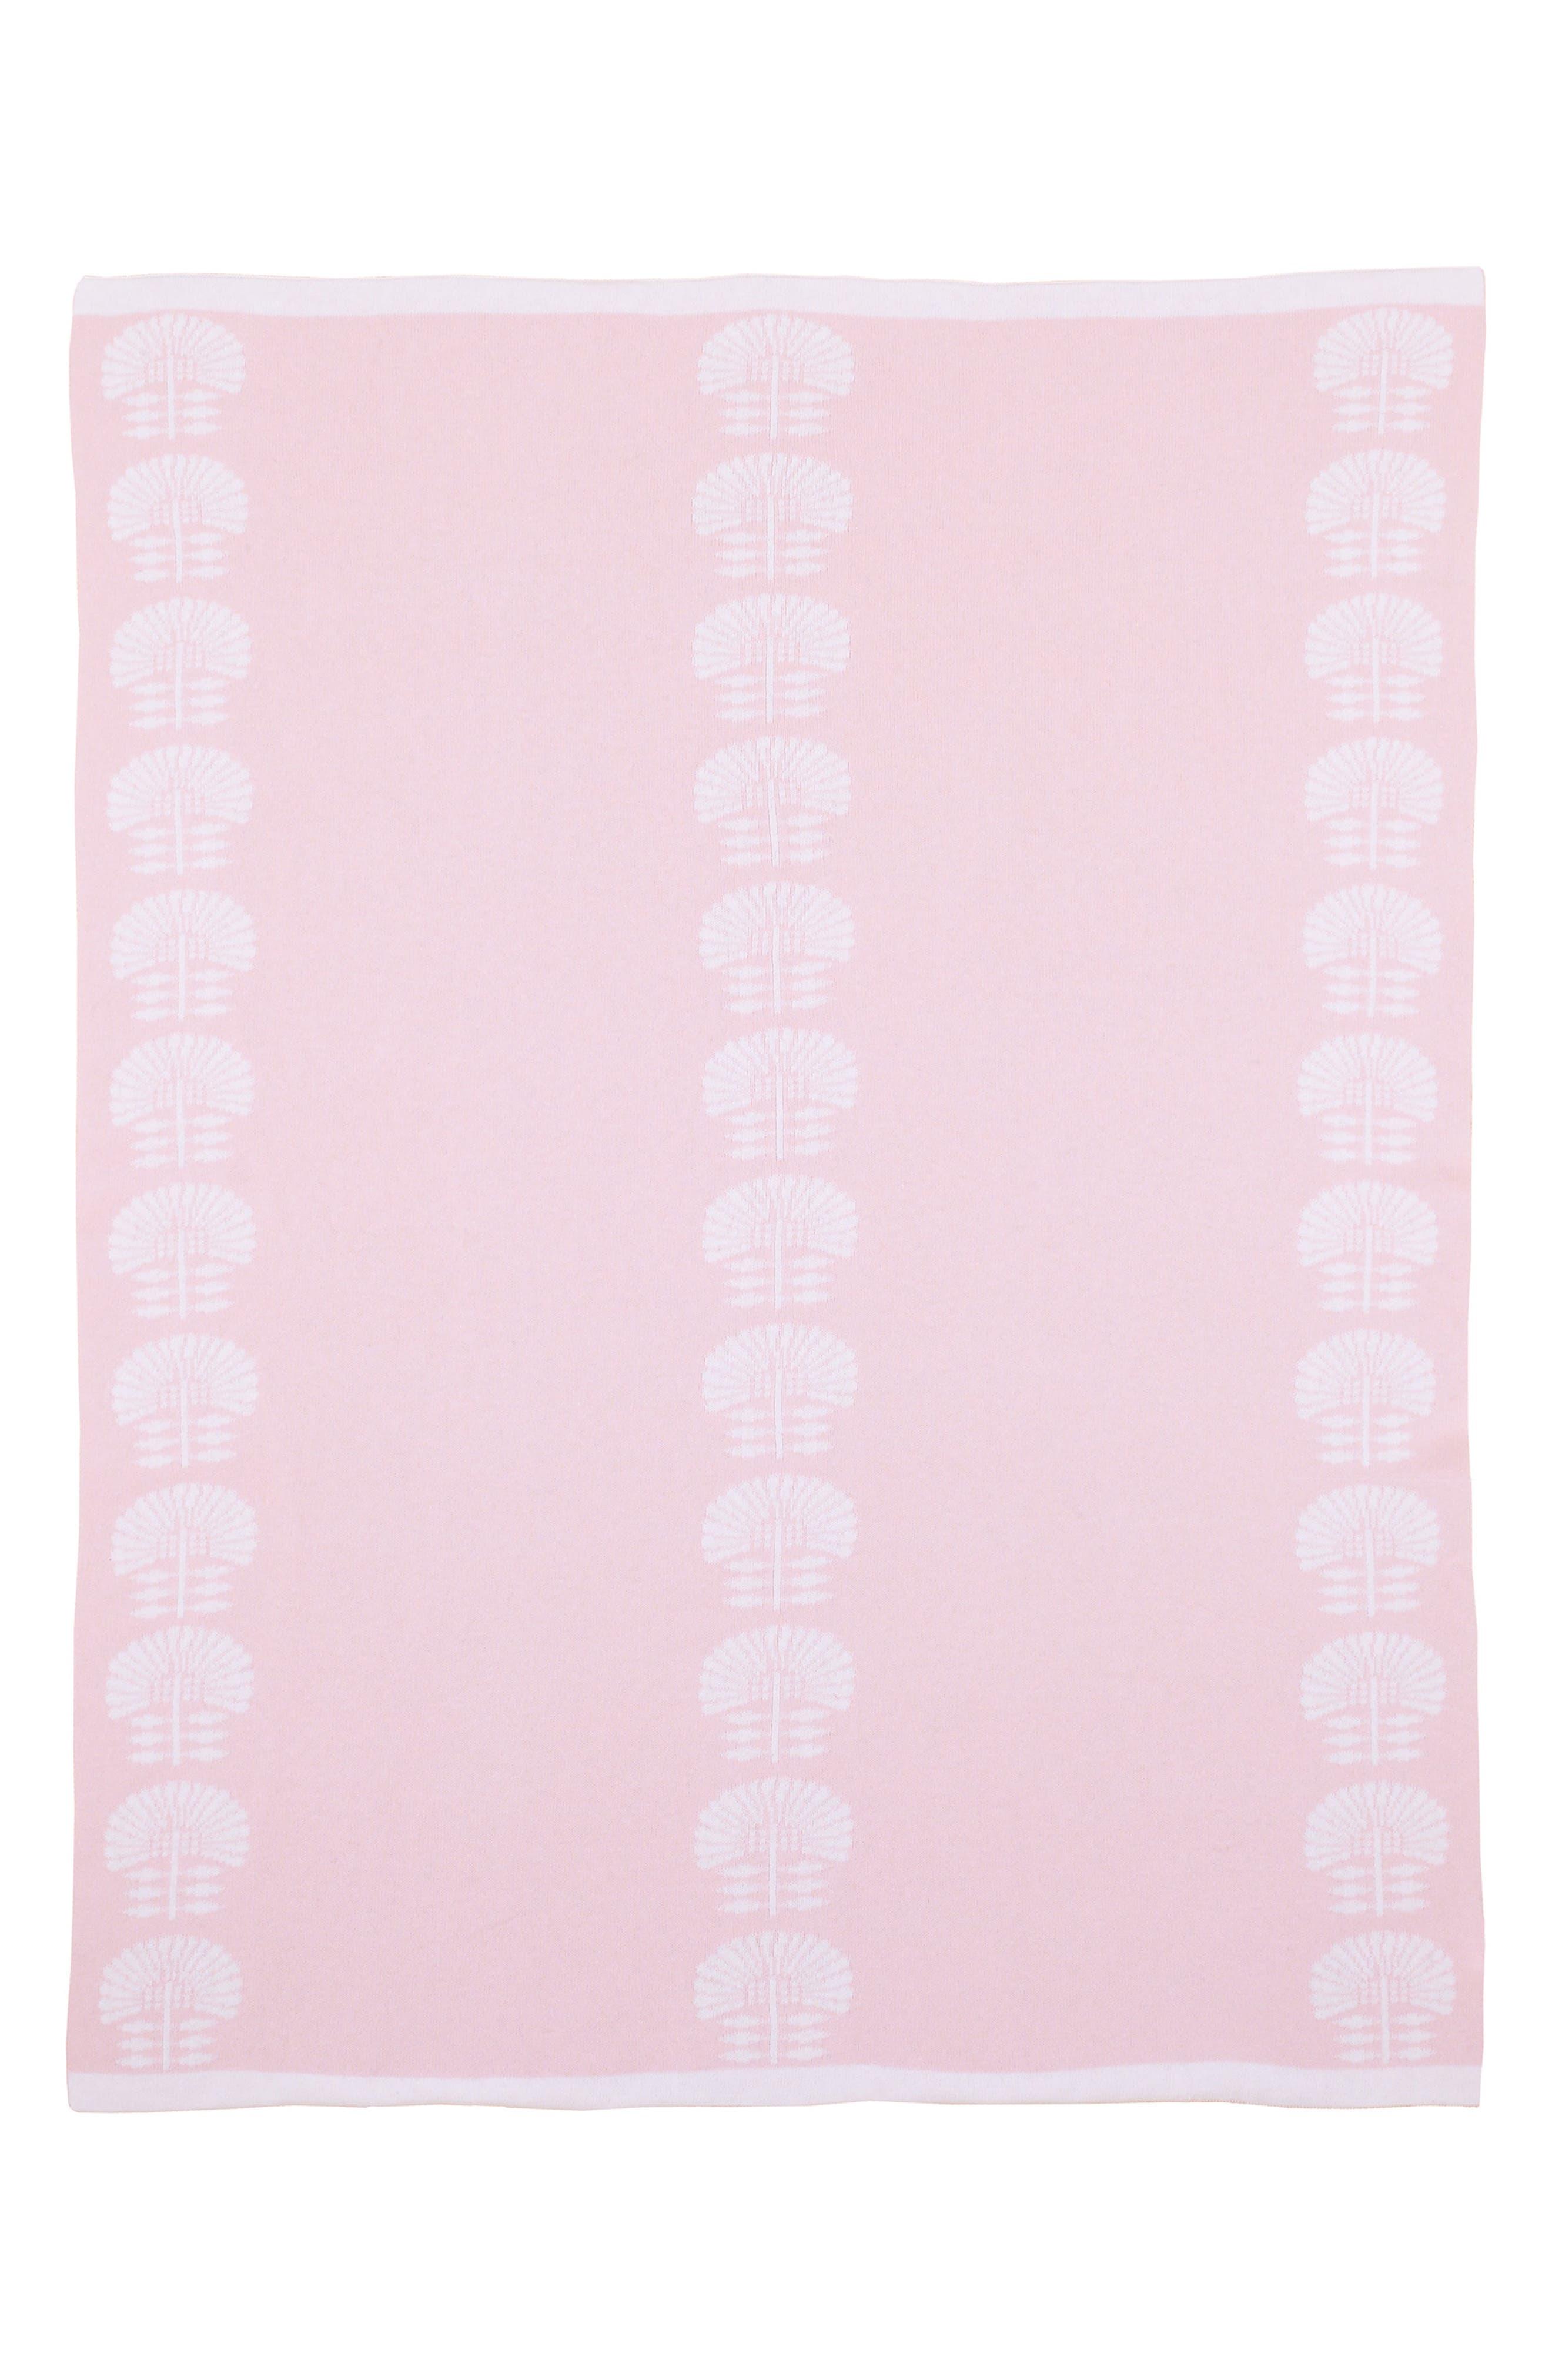 Petunia Pickle Bottom Dreaming in Dax Blanket